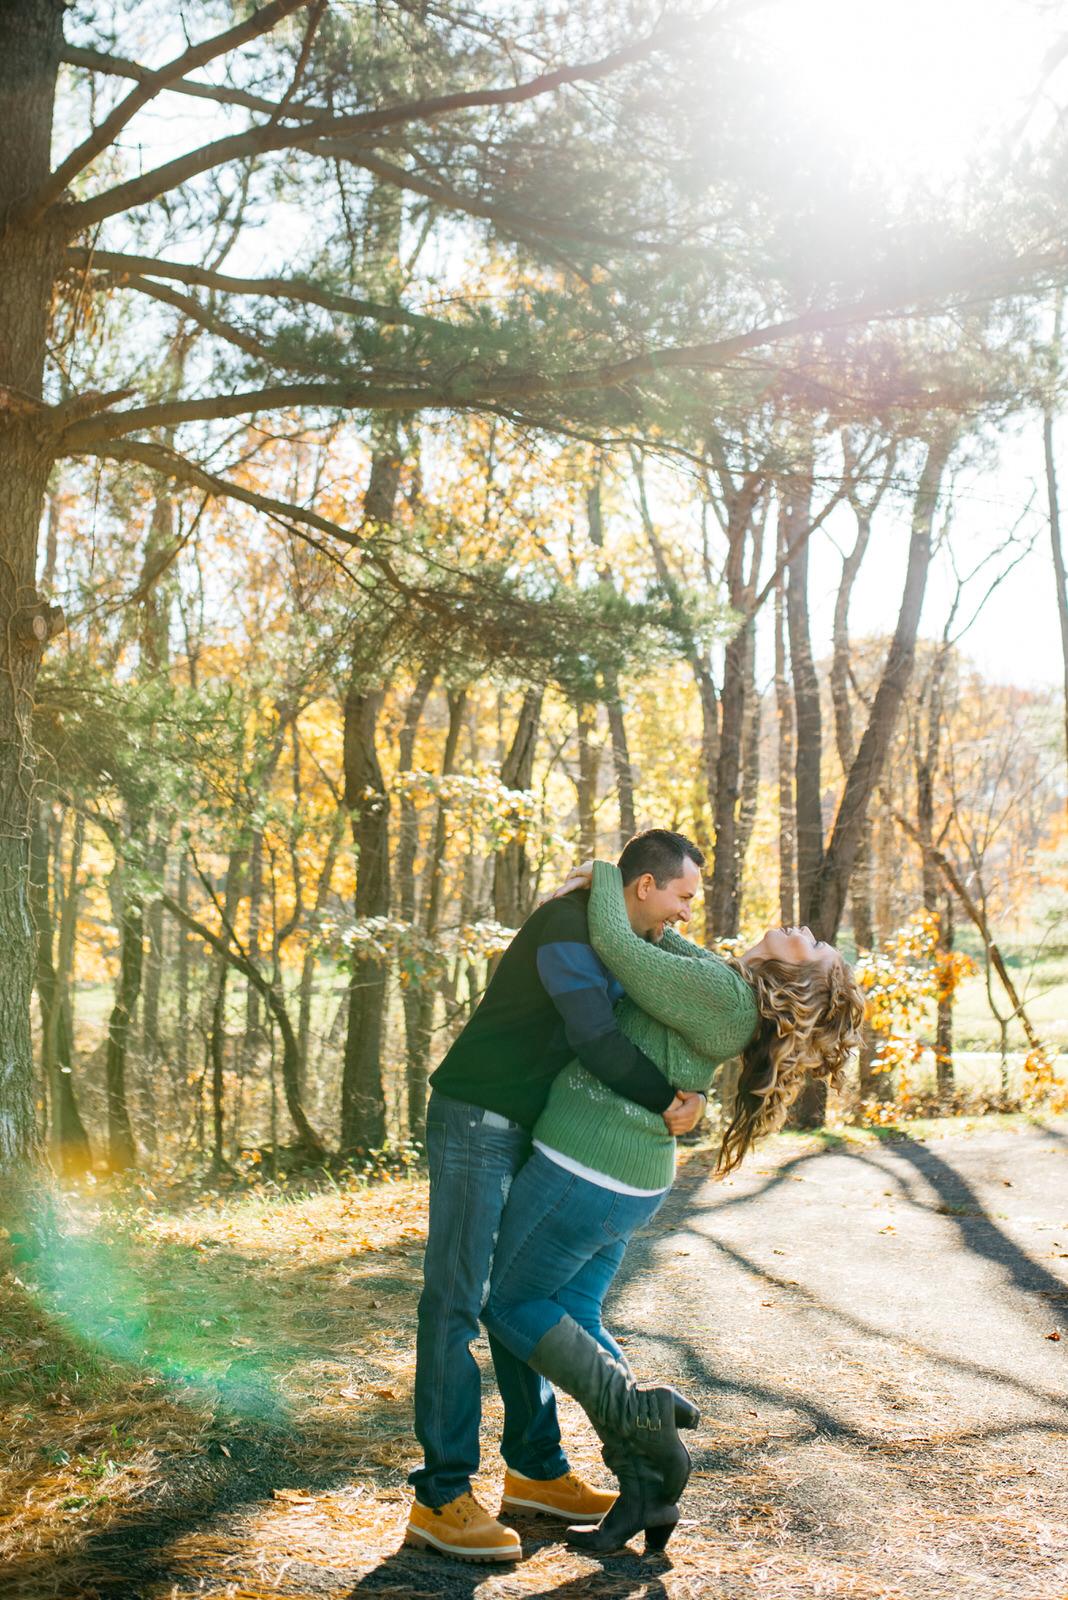 bradys-run-park-engagement-photo-025.jpg